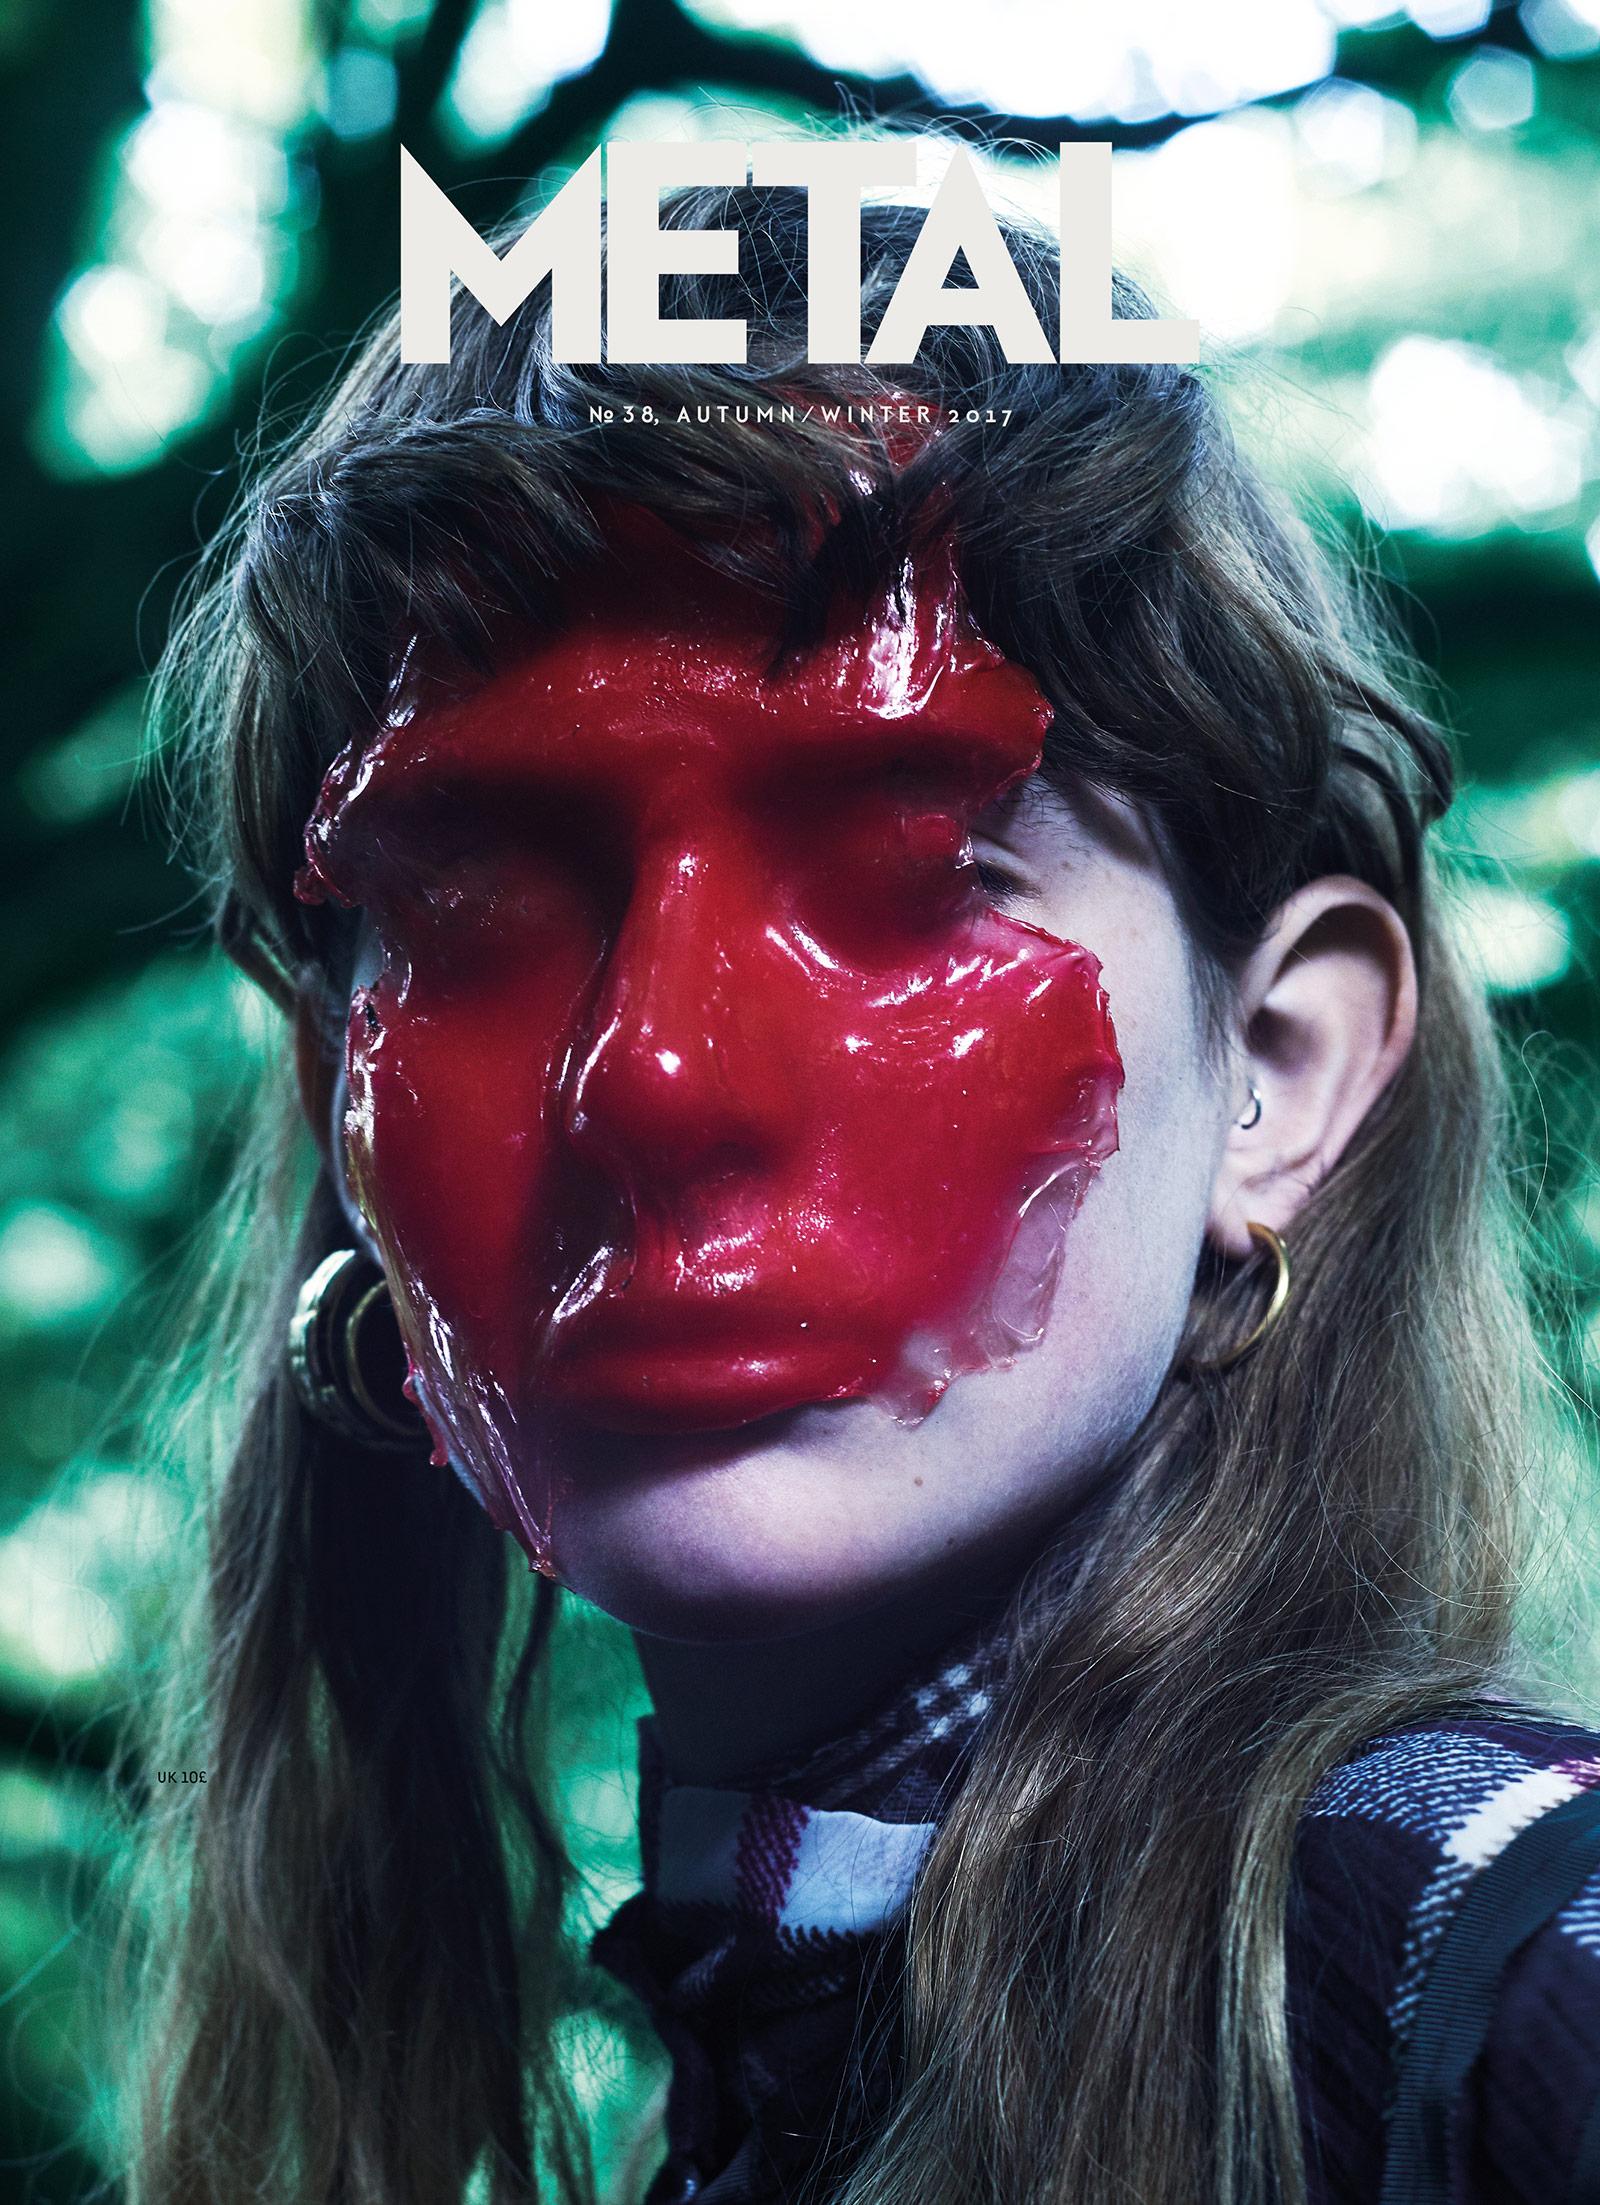 Cover 2 - Mathilde (Rebel Management) by Barrie Hullegie.